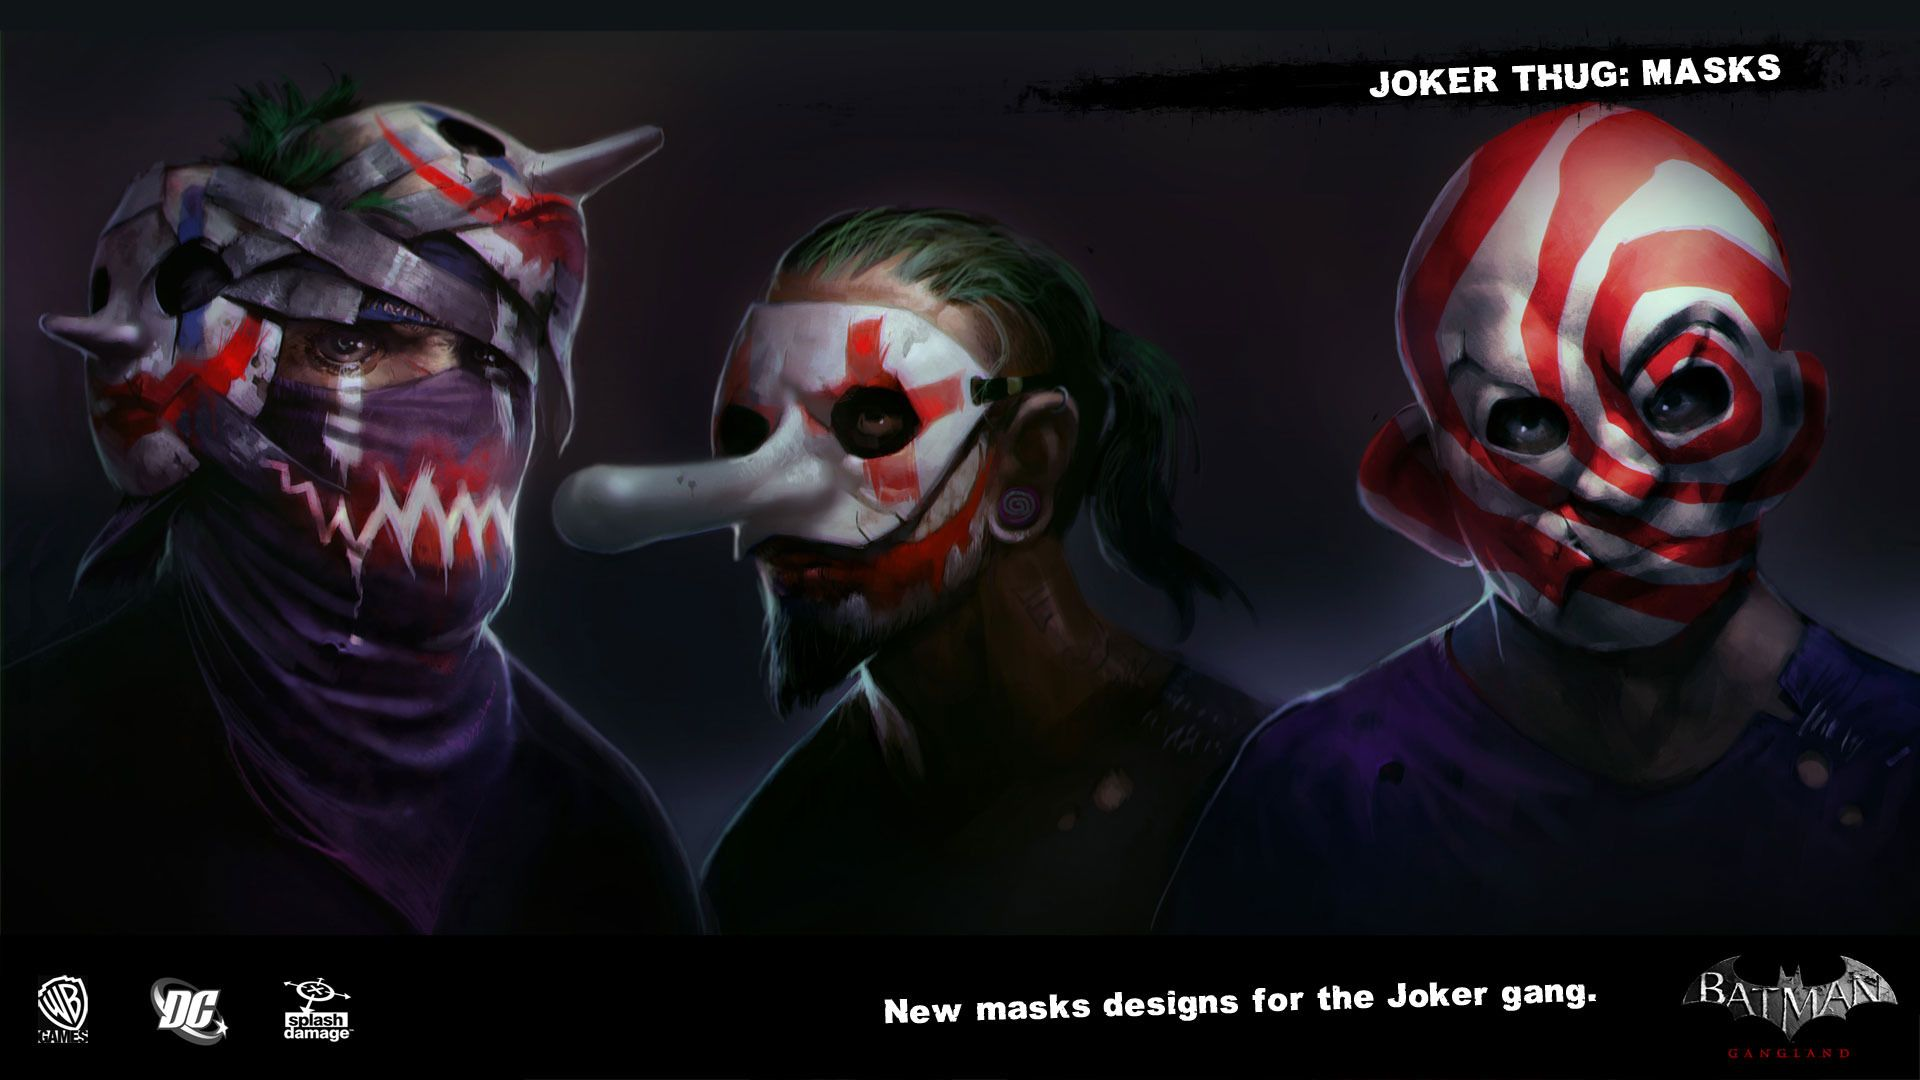 Joker-Thugs-Masks.jpg (1920×1080) | BATMAN Arkham Origin ...